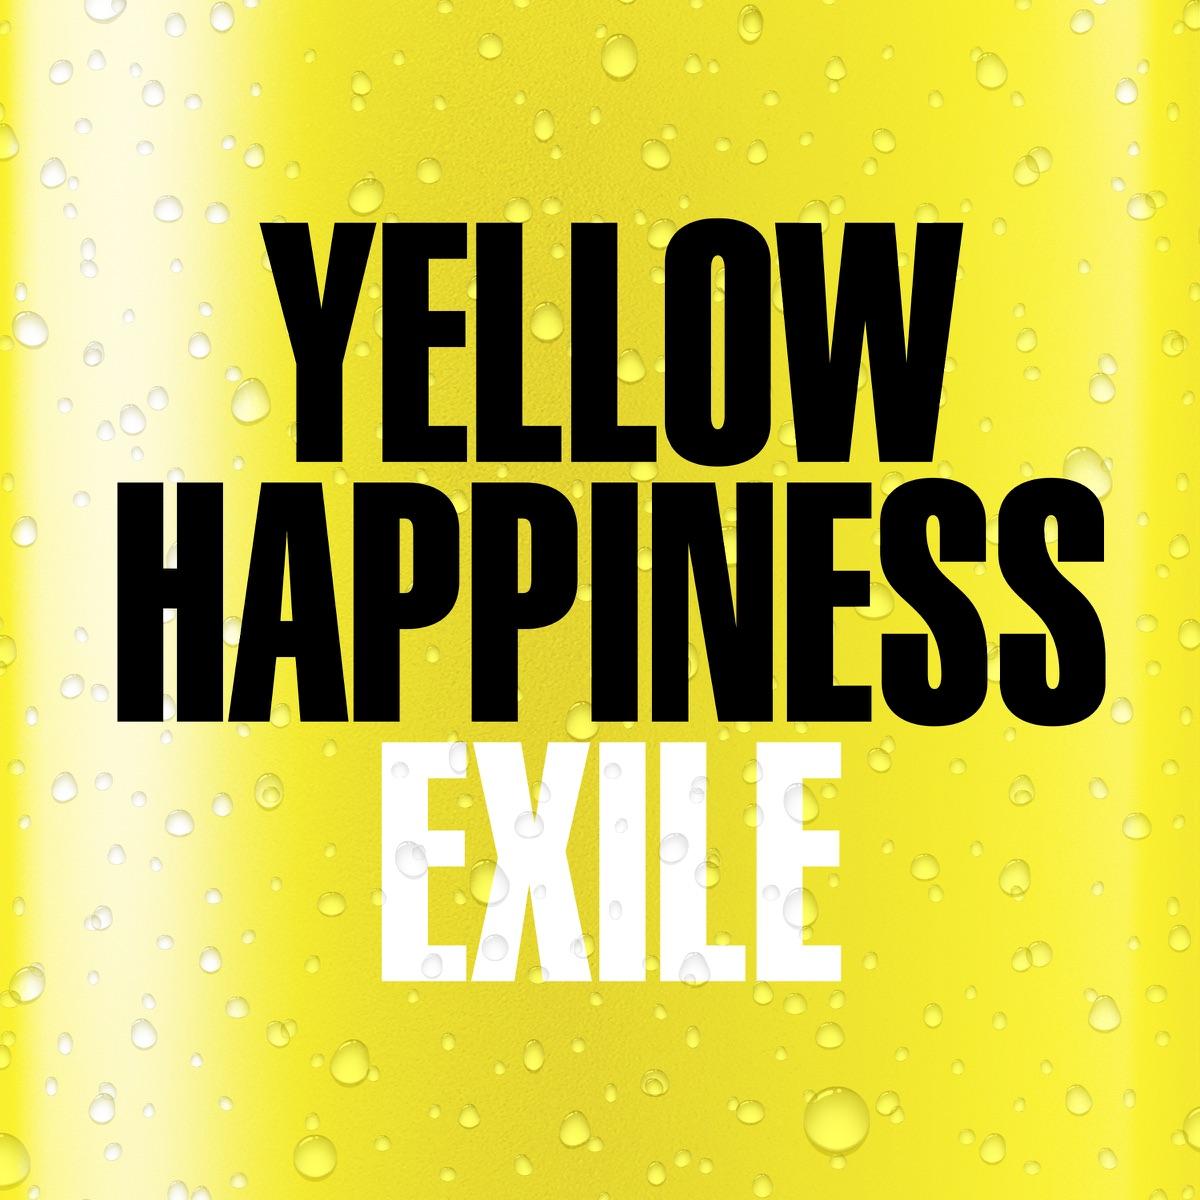 『EXILE - YELLOW HAPPINESS』収録の『YELLOW HAPPINESS』ジャケット